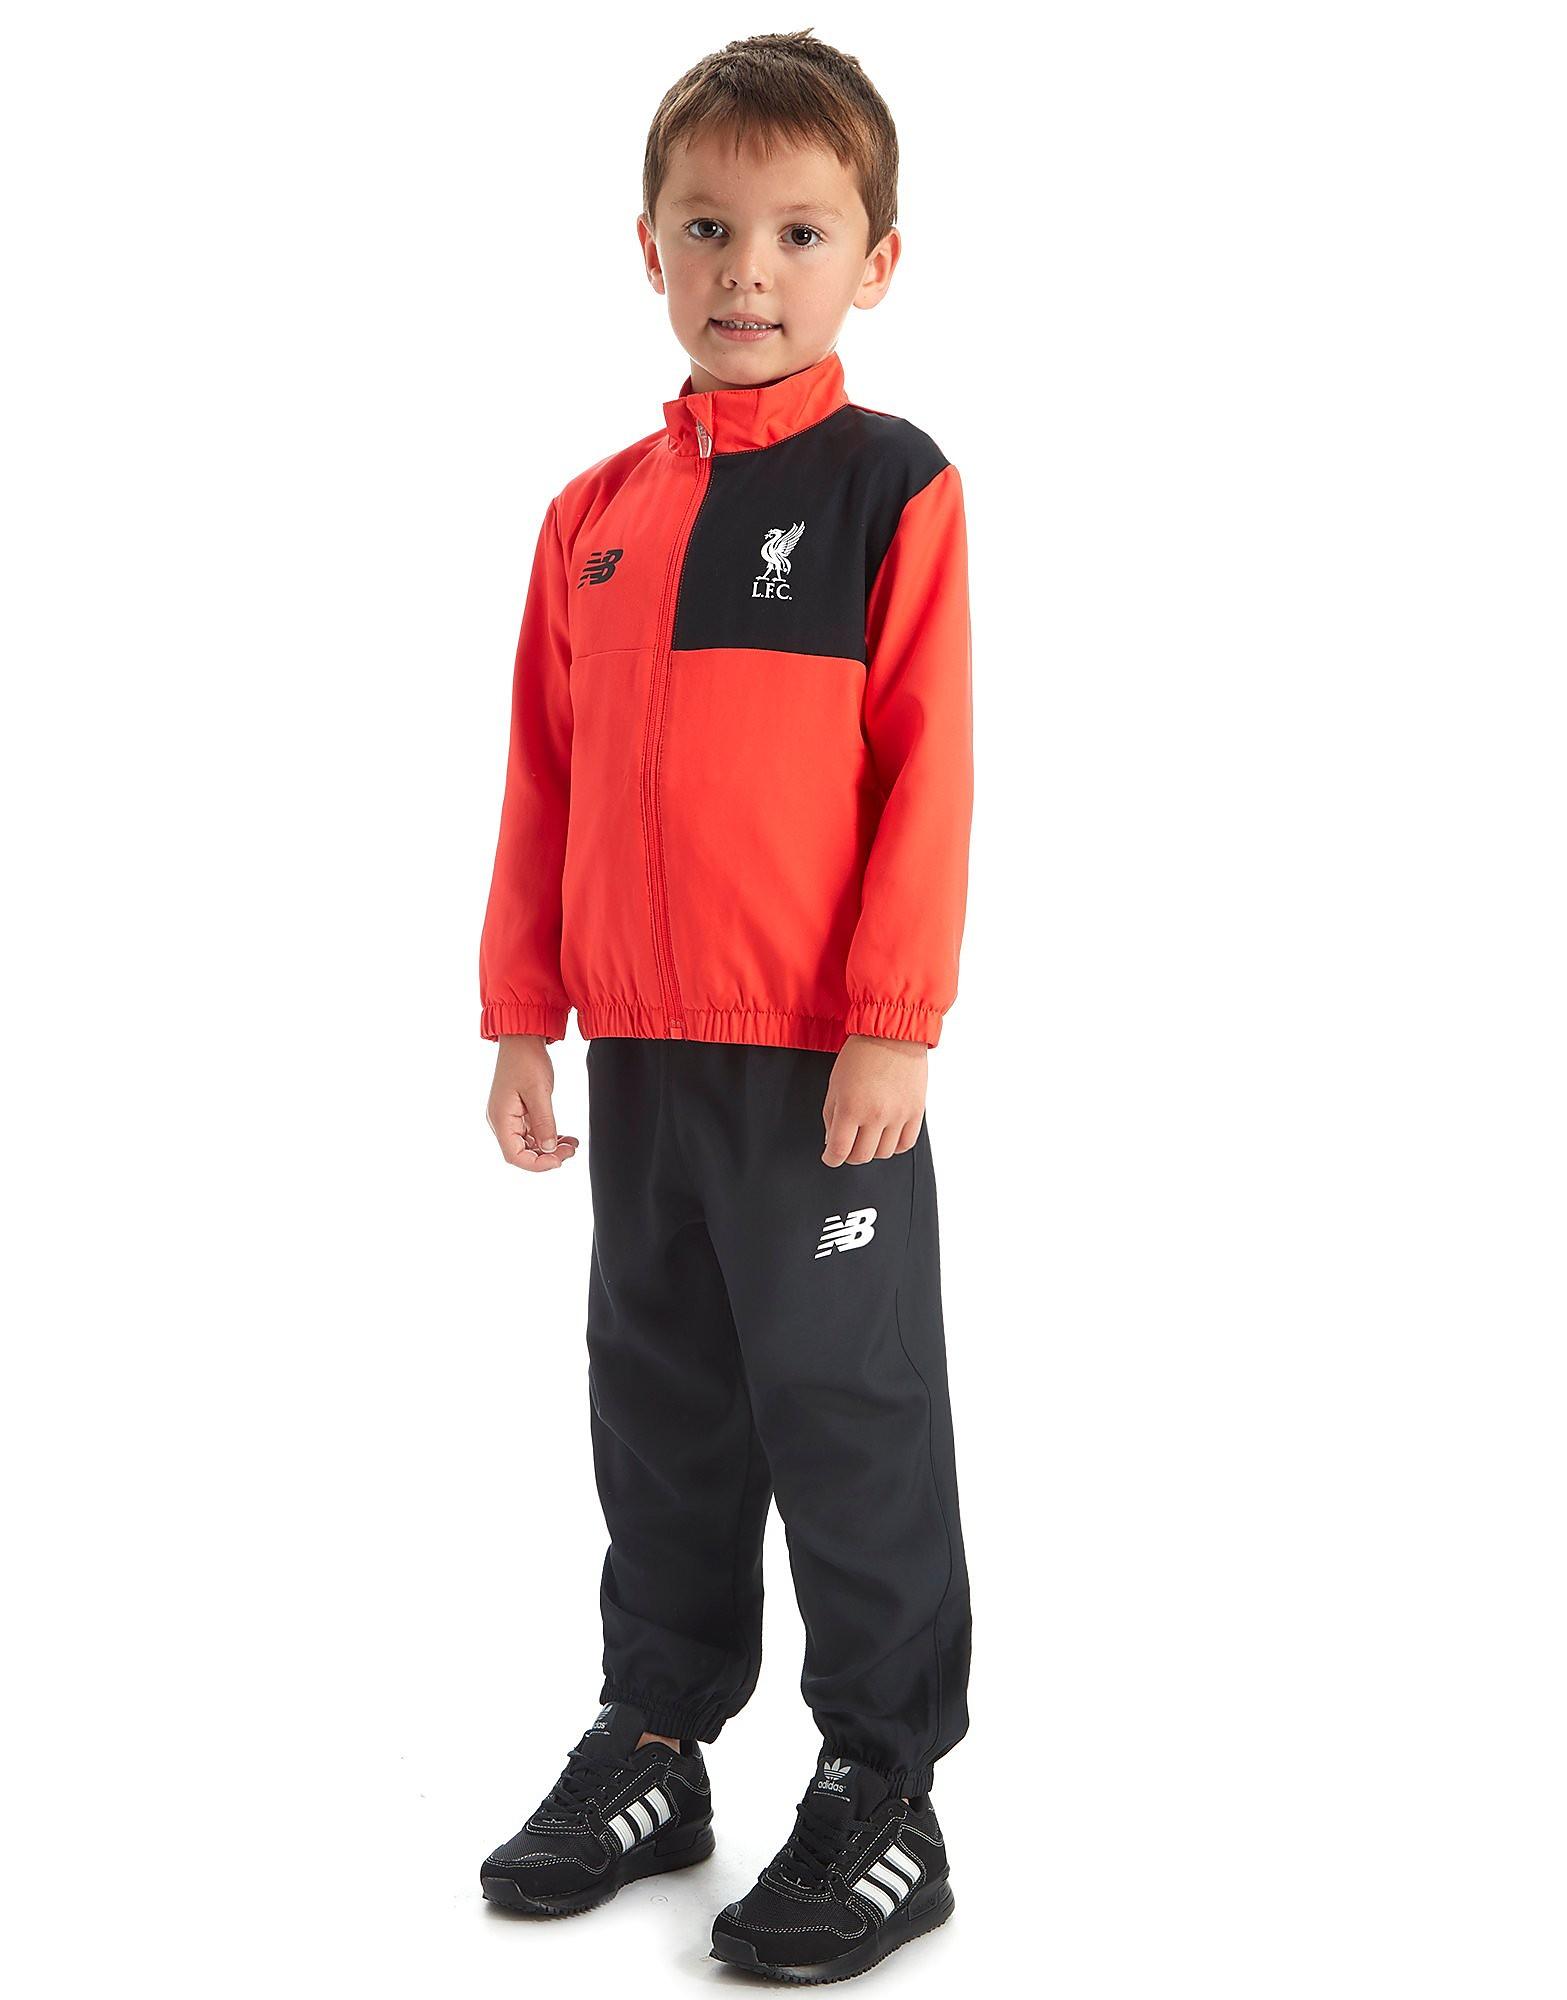 New Balance Liverpool FC Suit Children